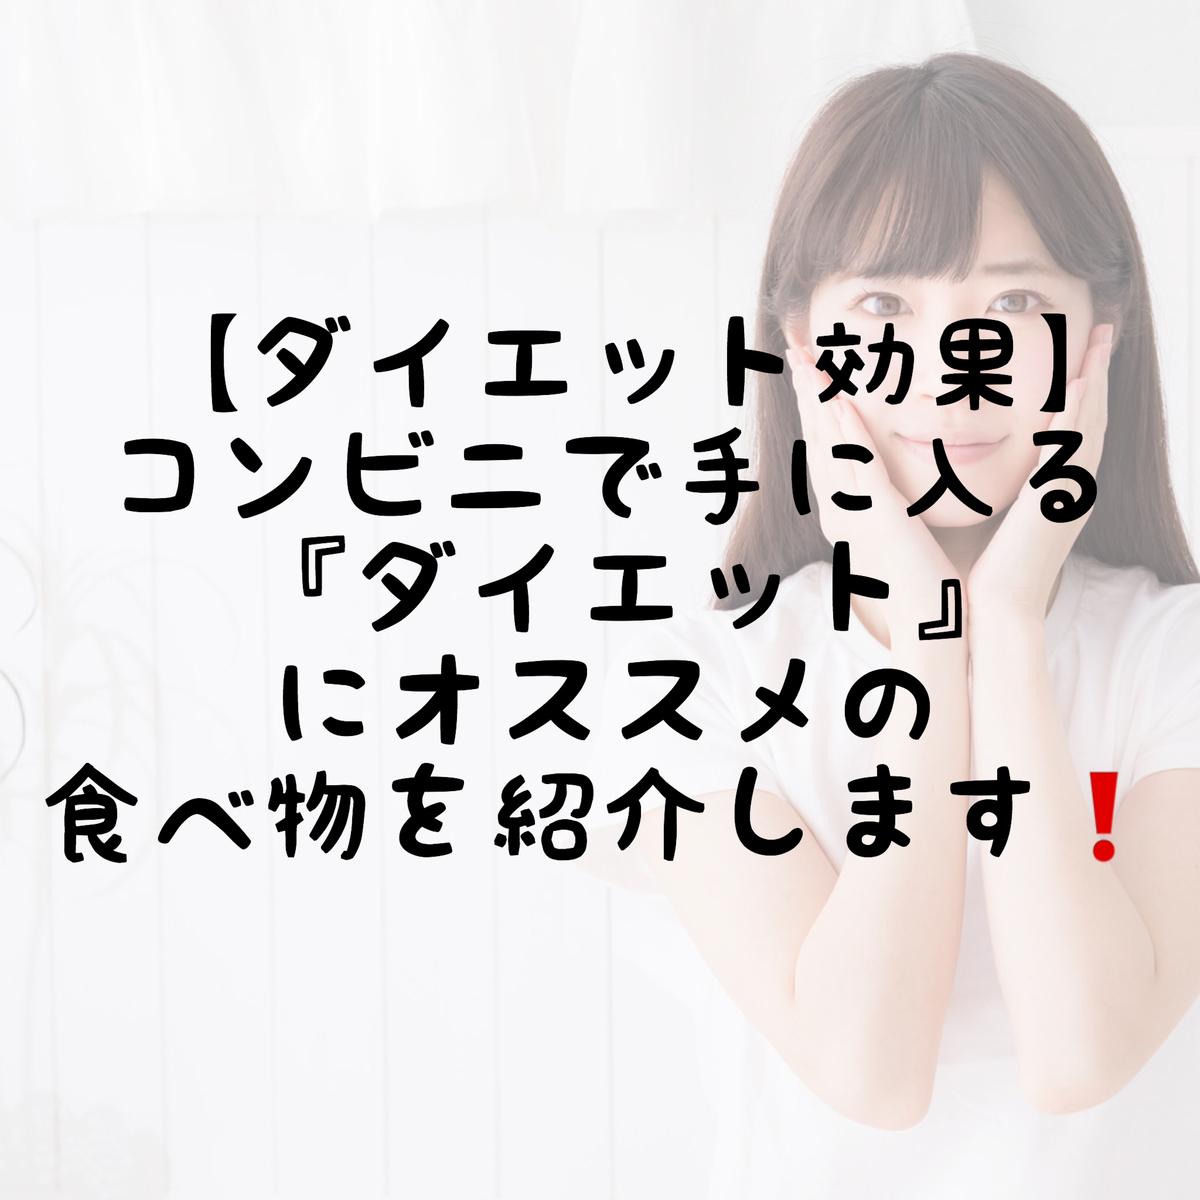 f:id:nokonoko_o:20200602150132j:plain